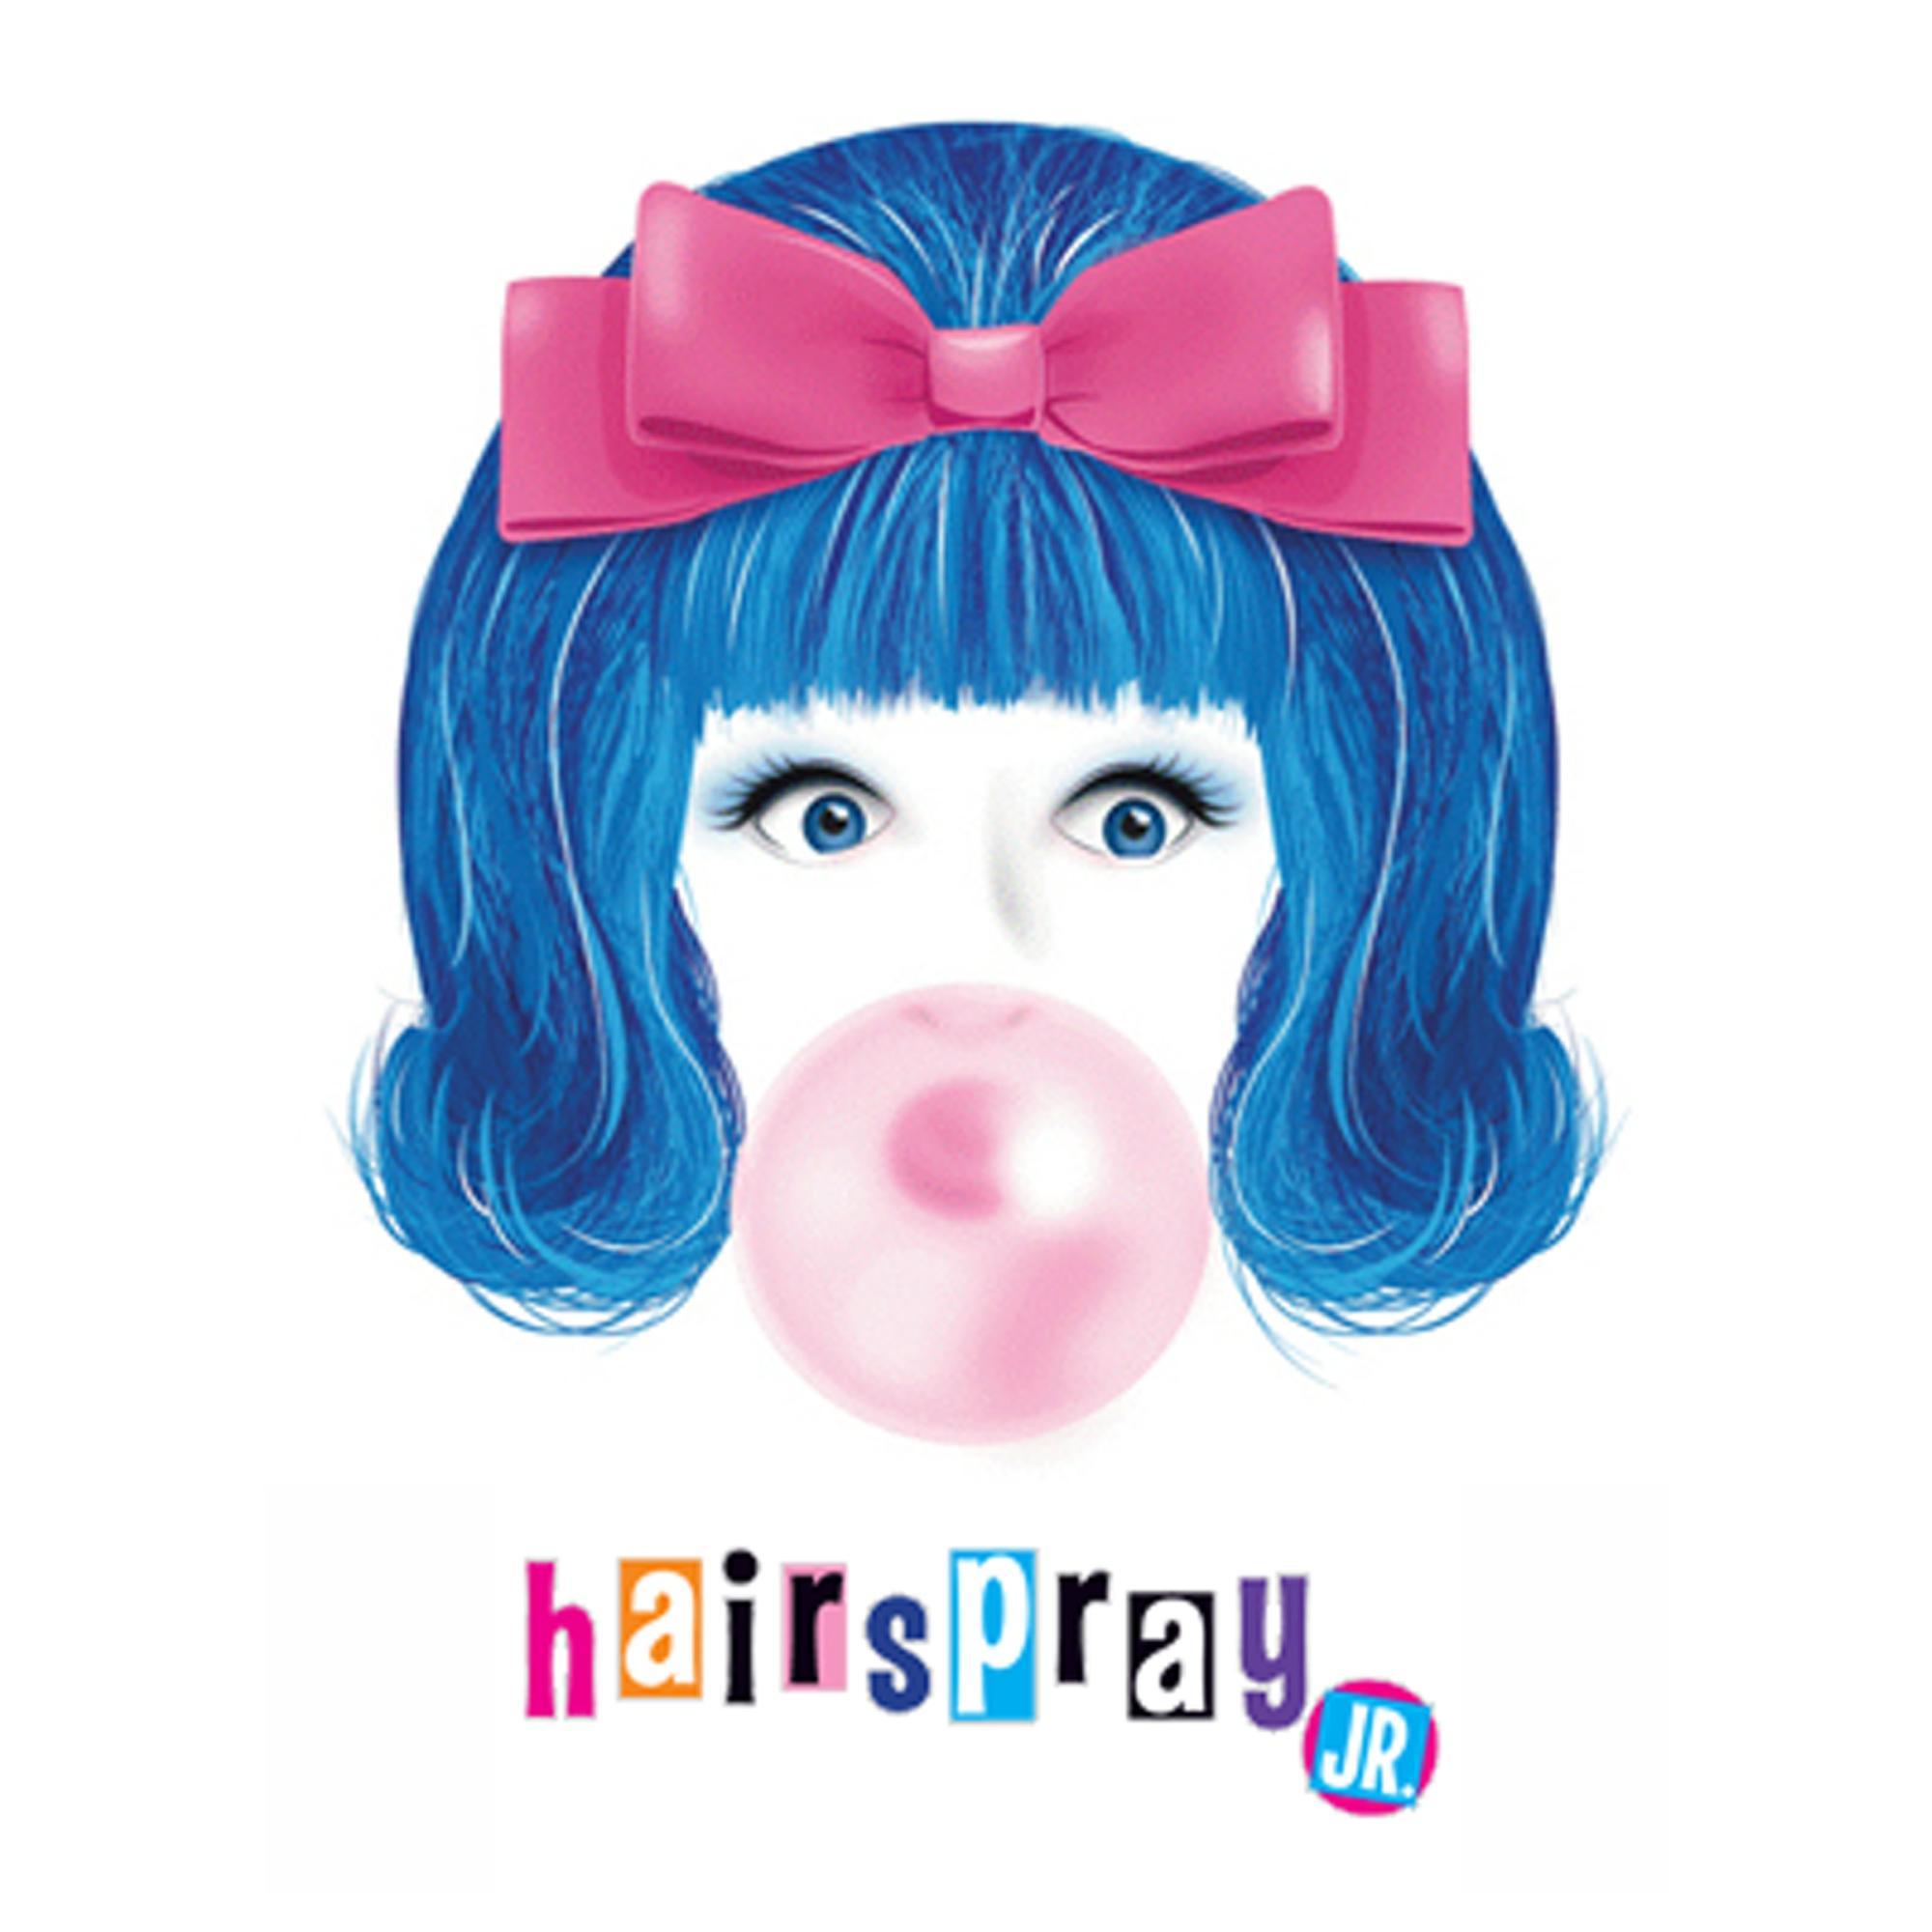 Image result for hairspray jr. logo